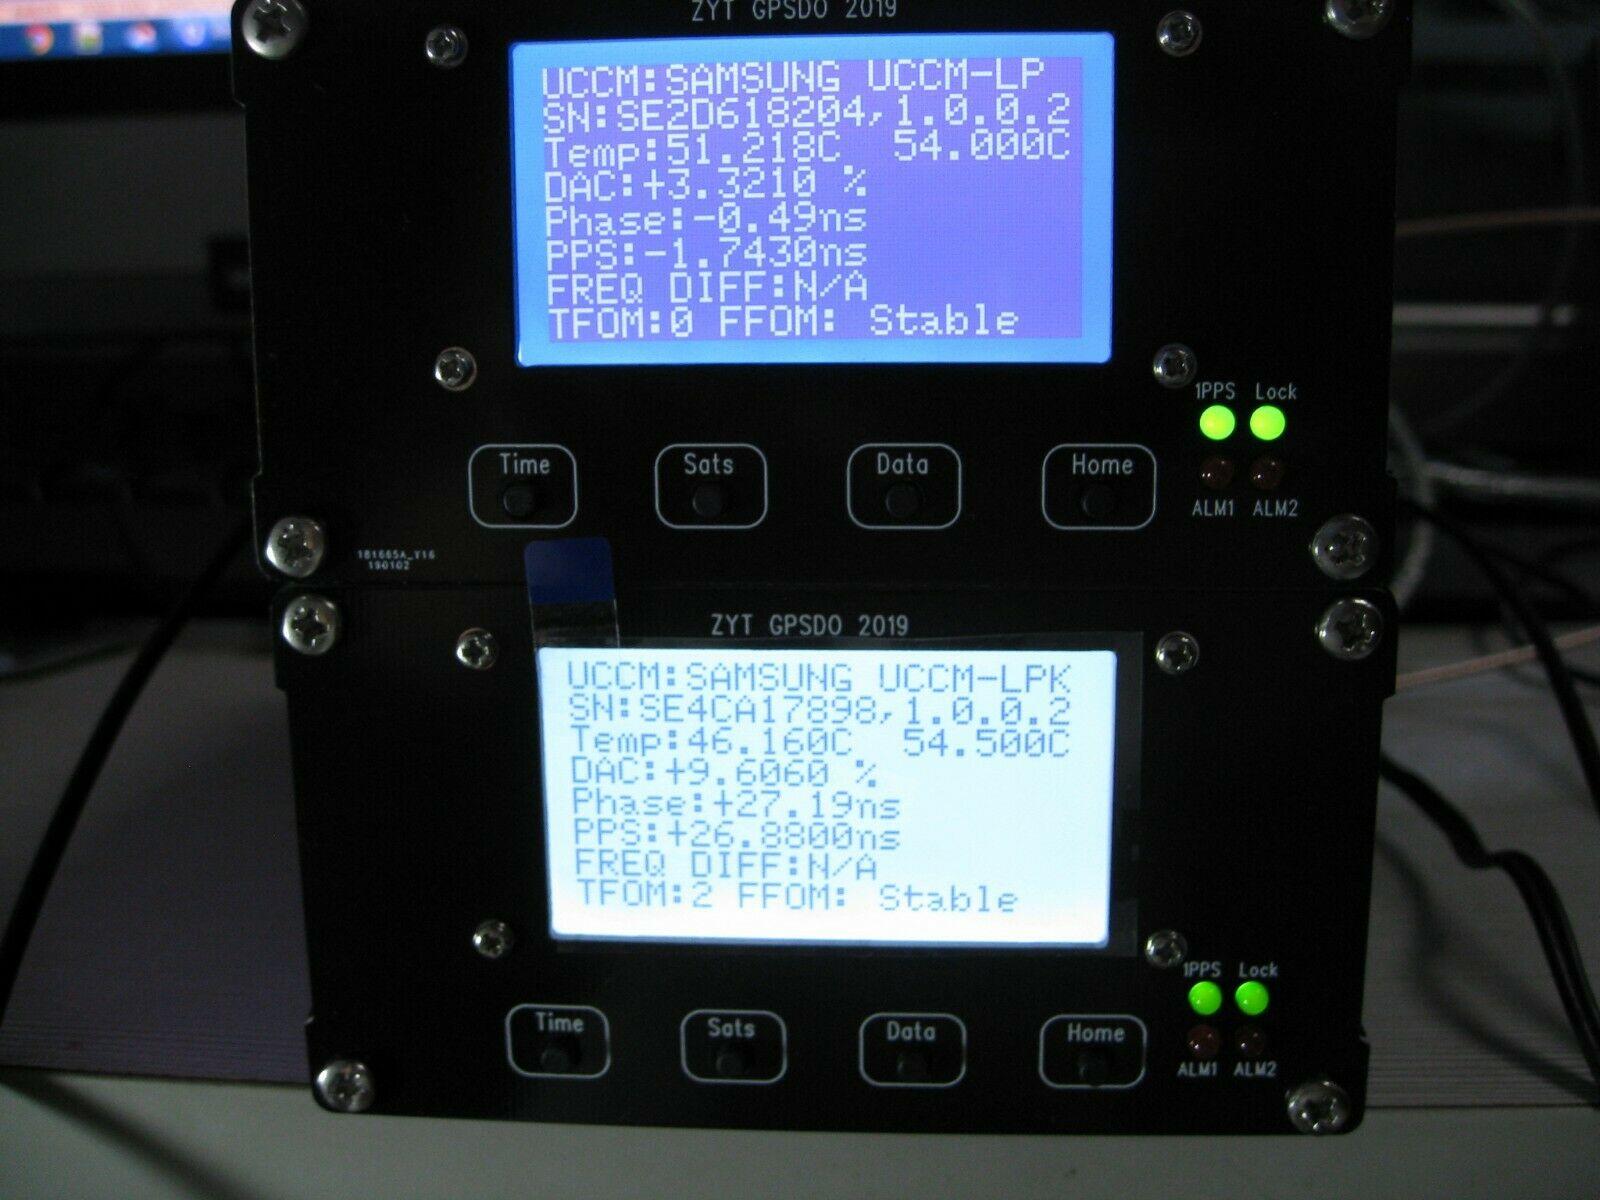 Free Shipping SAMSUNG STP2878LF LCD GPSDO 10MHz 1PPS OCXO GPS Disciplined Oscillator 2019-5-8